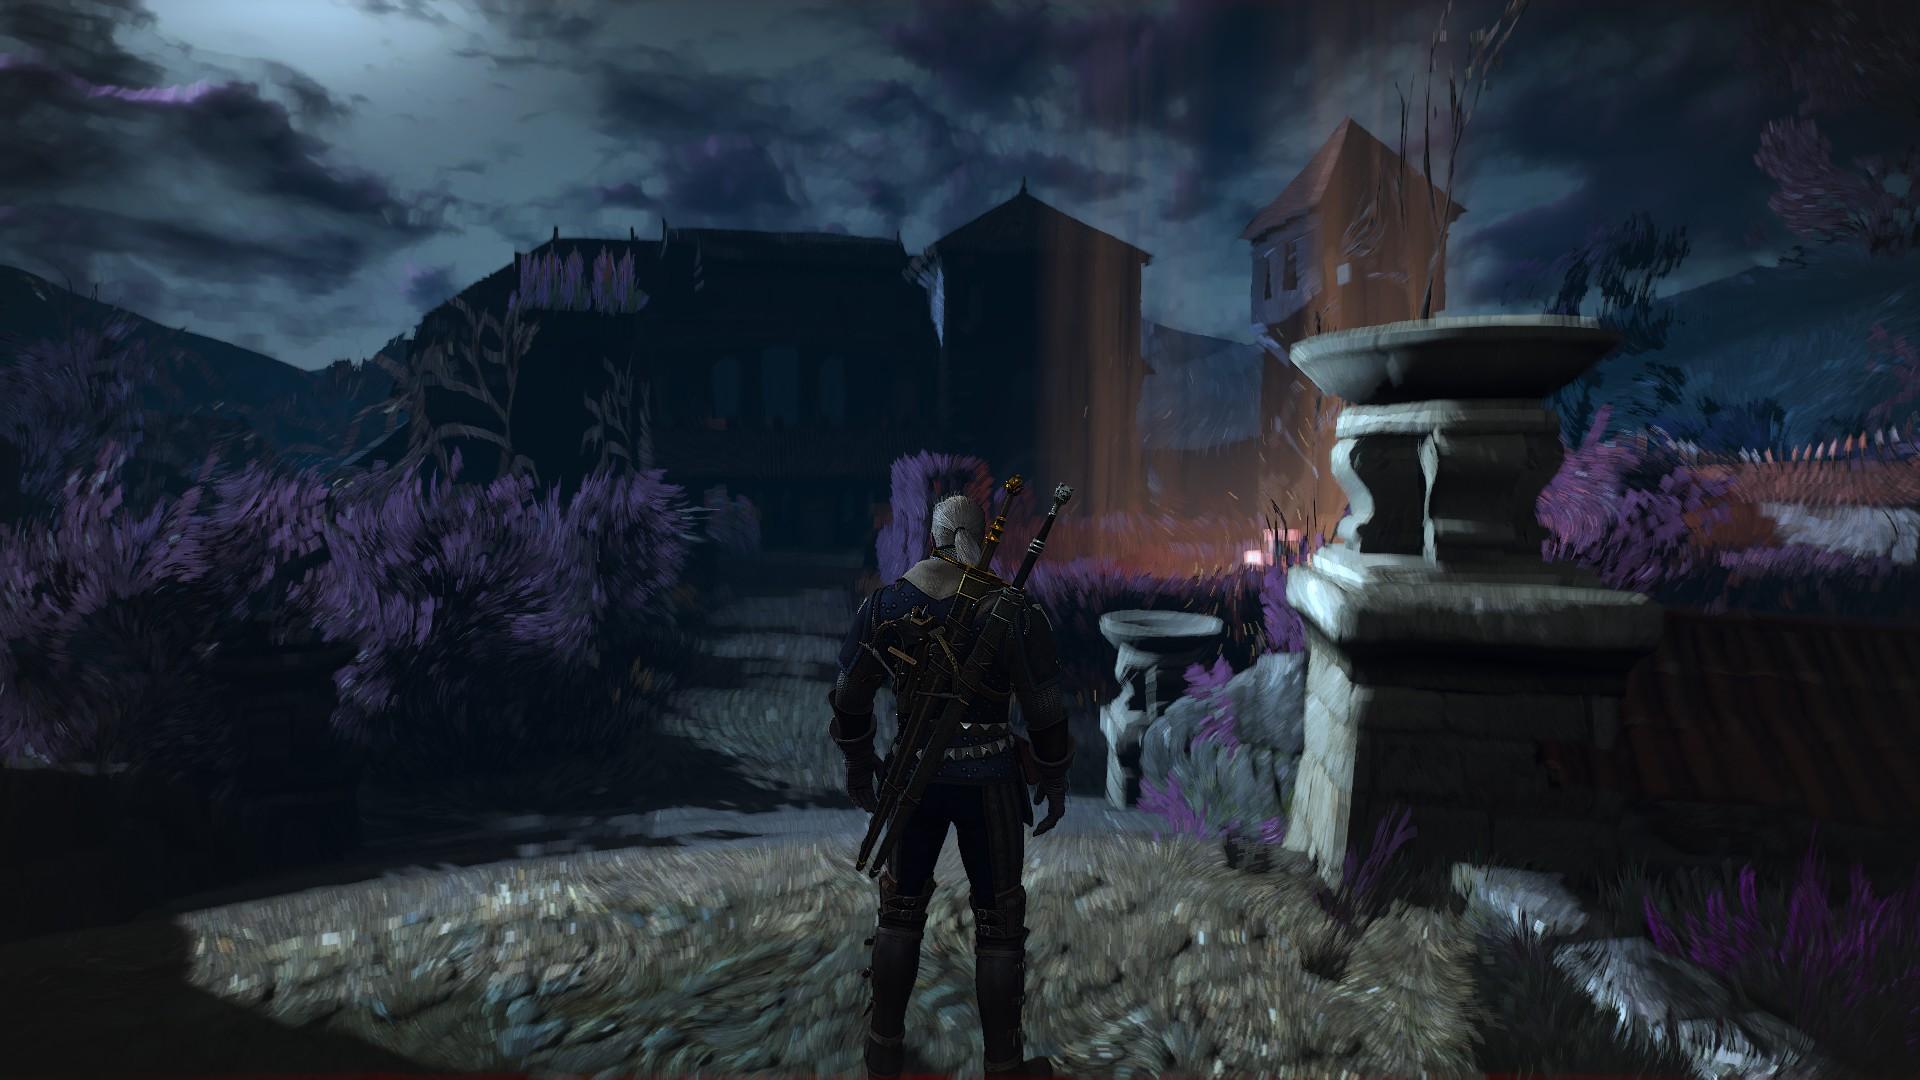 Wallpaper The Witcher 3 Wild Hunt Fantasy Art Geralt Of Rivia